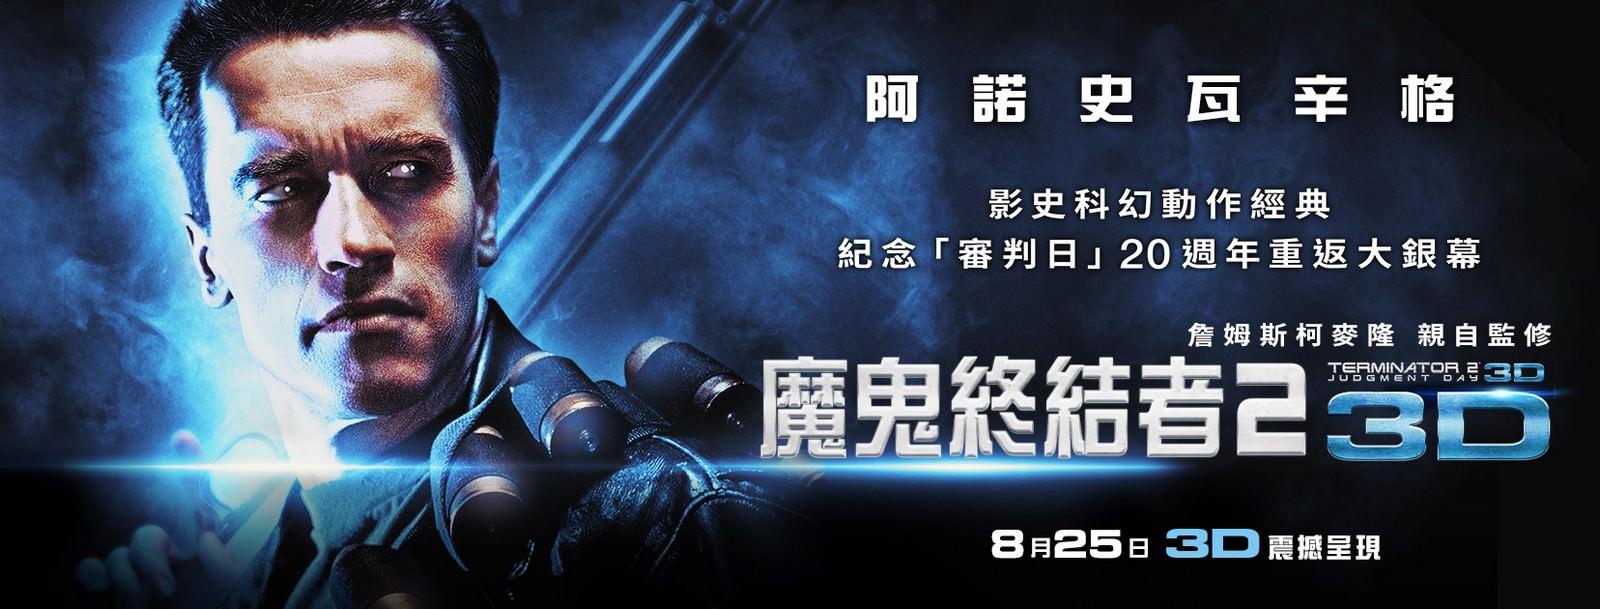 Movie, Terminator 2: Judgment Day(美國, 1991年) / 魔鬼終結者2(台灣) / 终结者2:审判日(中國) / 未來戰士續集(香港), 電影海報, 台灣, 橫版